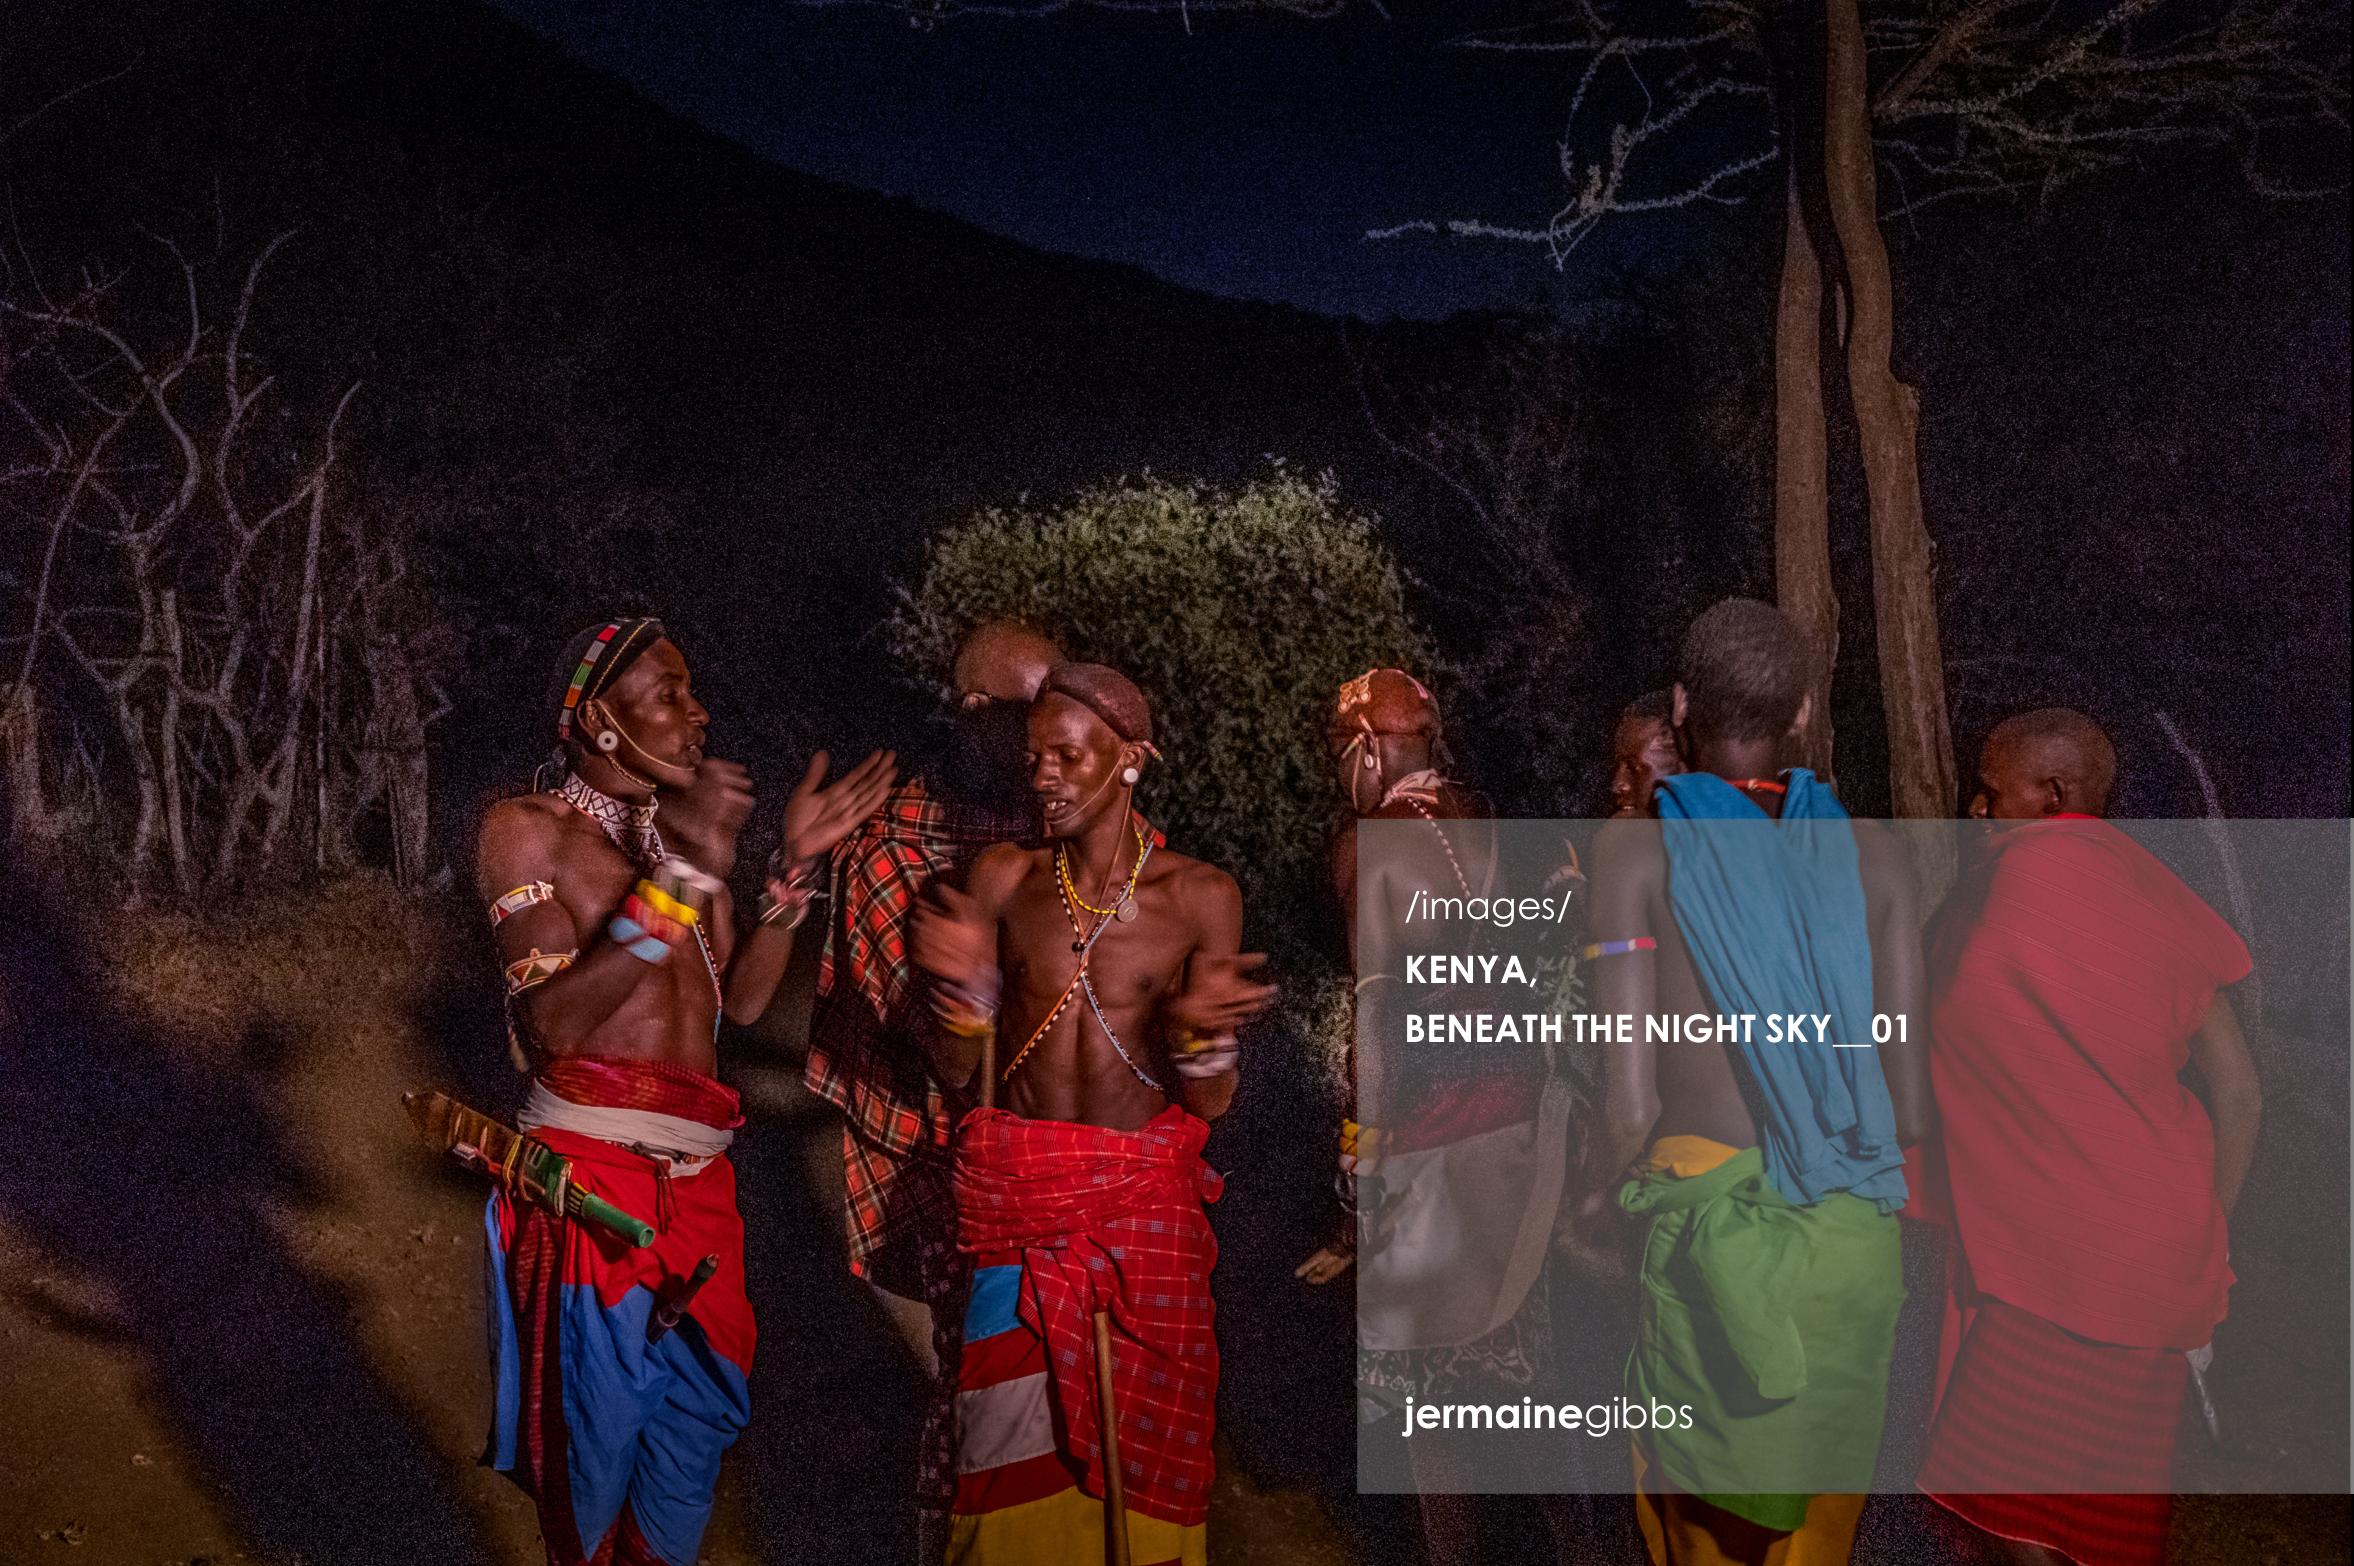 Kenya_Beneath The Night Sky__01